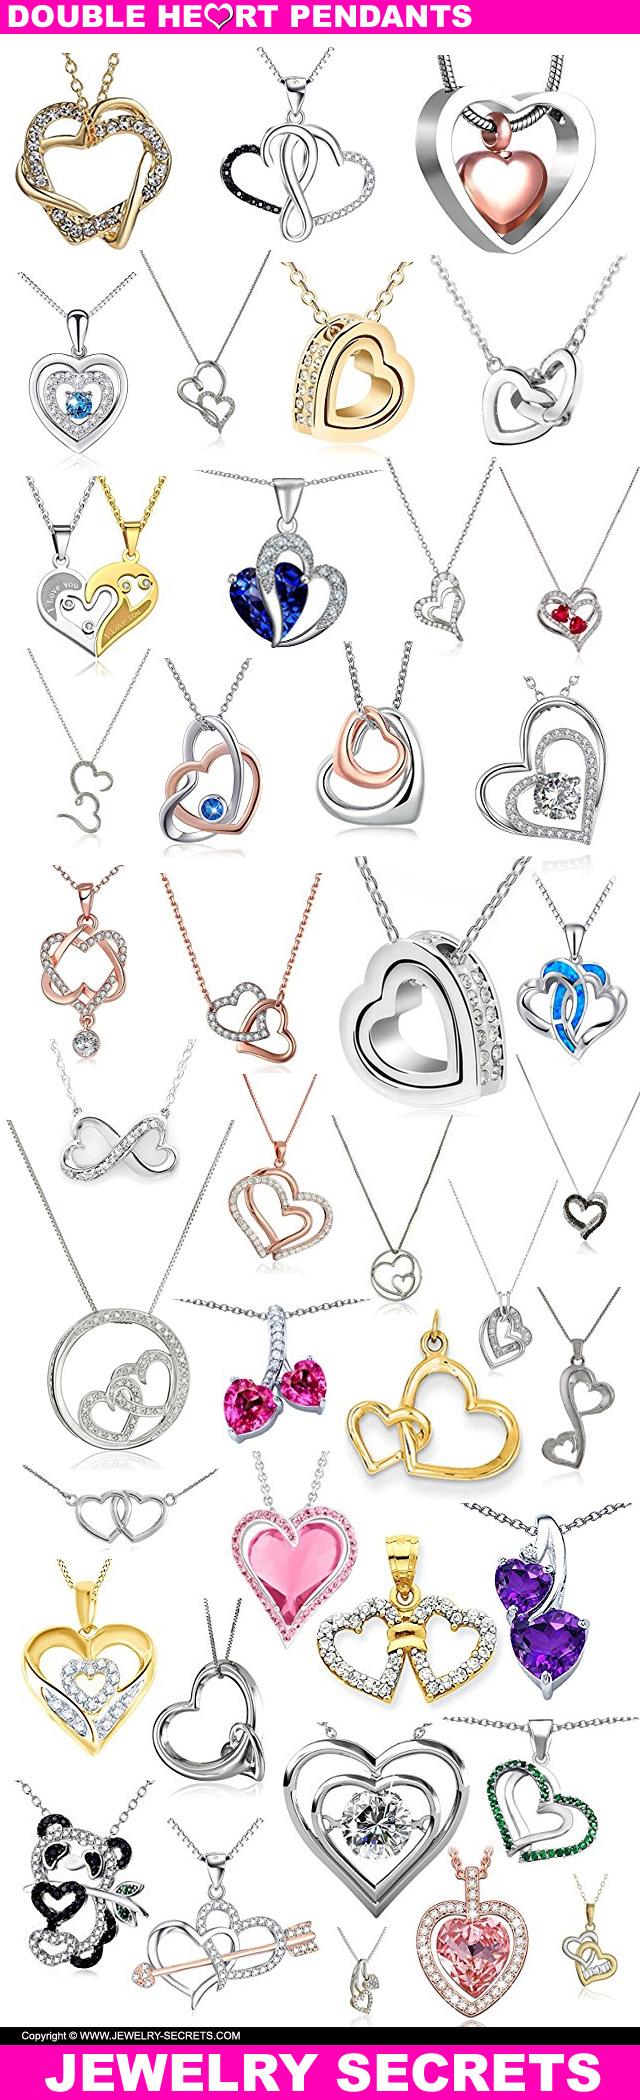 double heart pendant jewelry